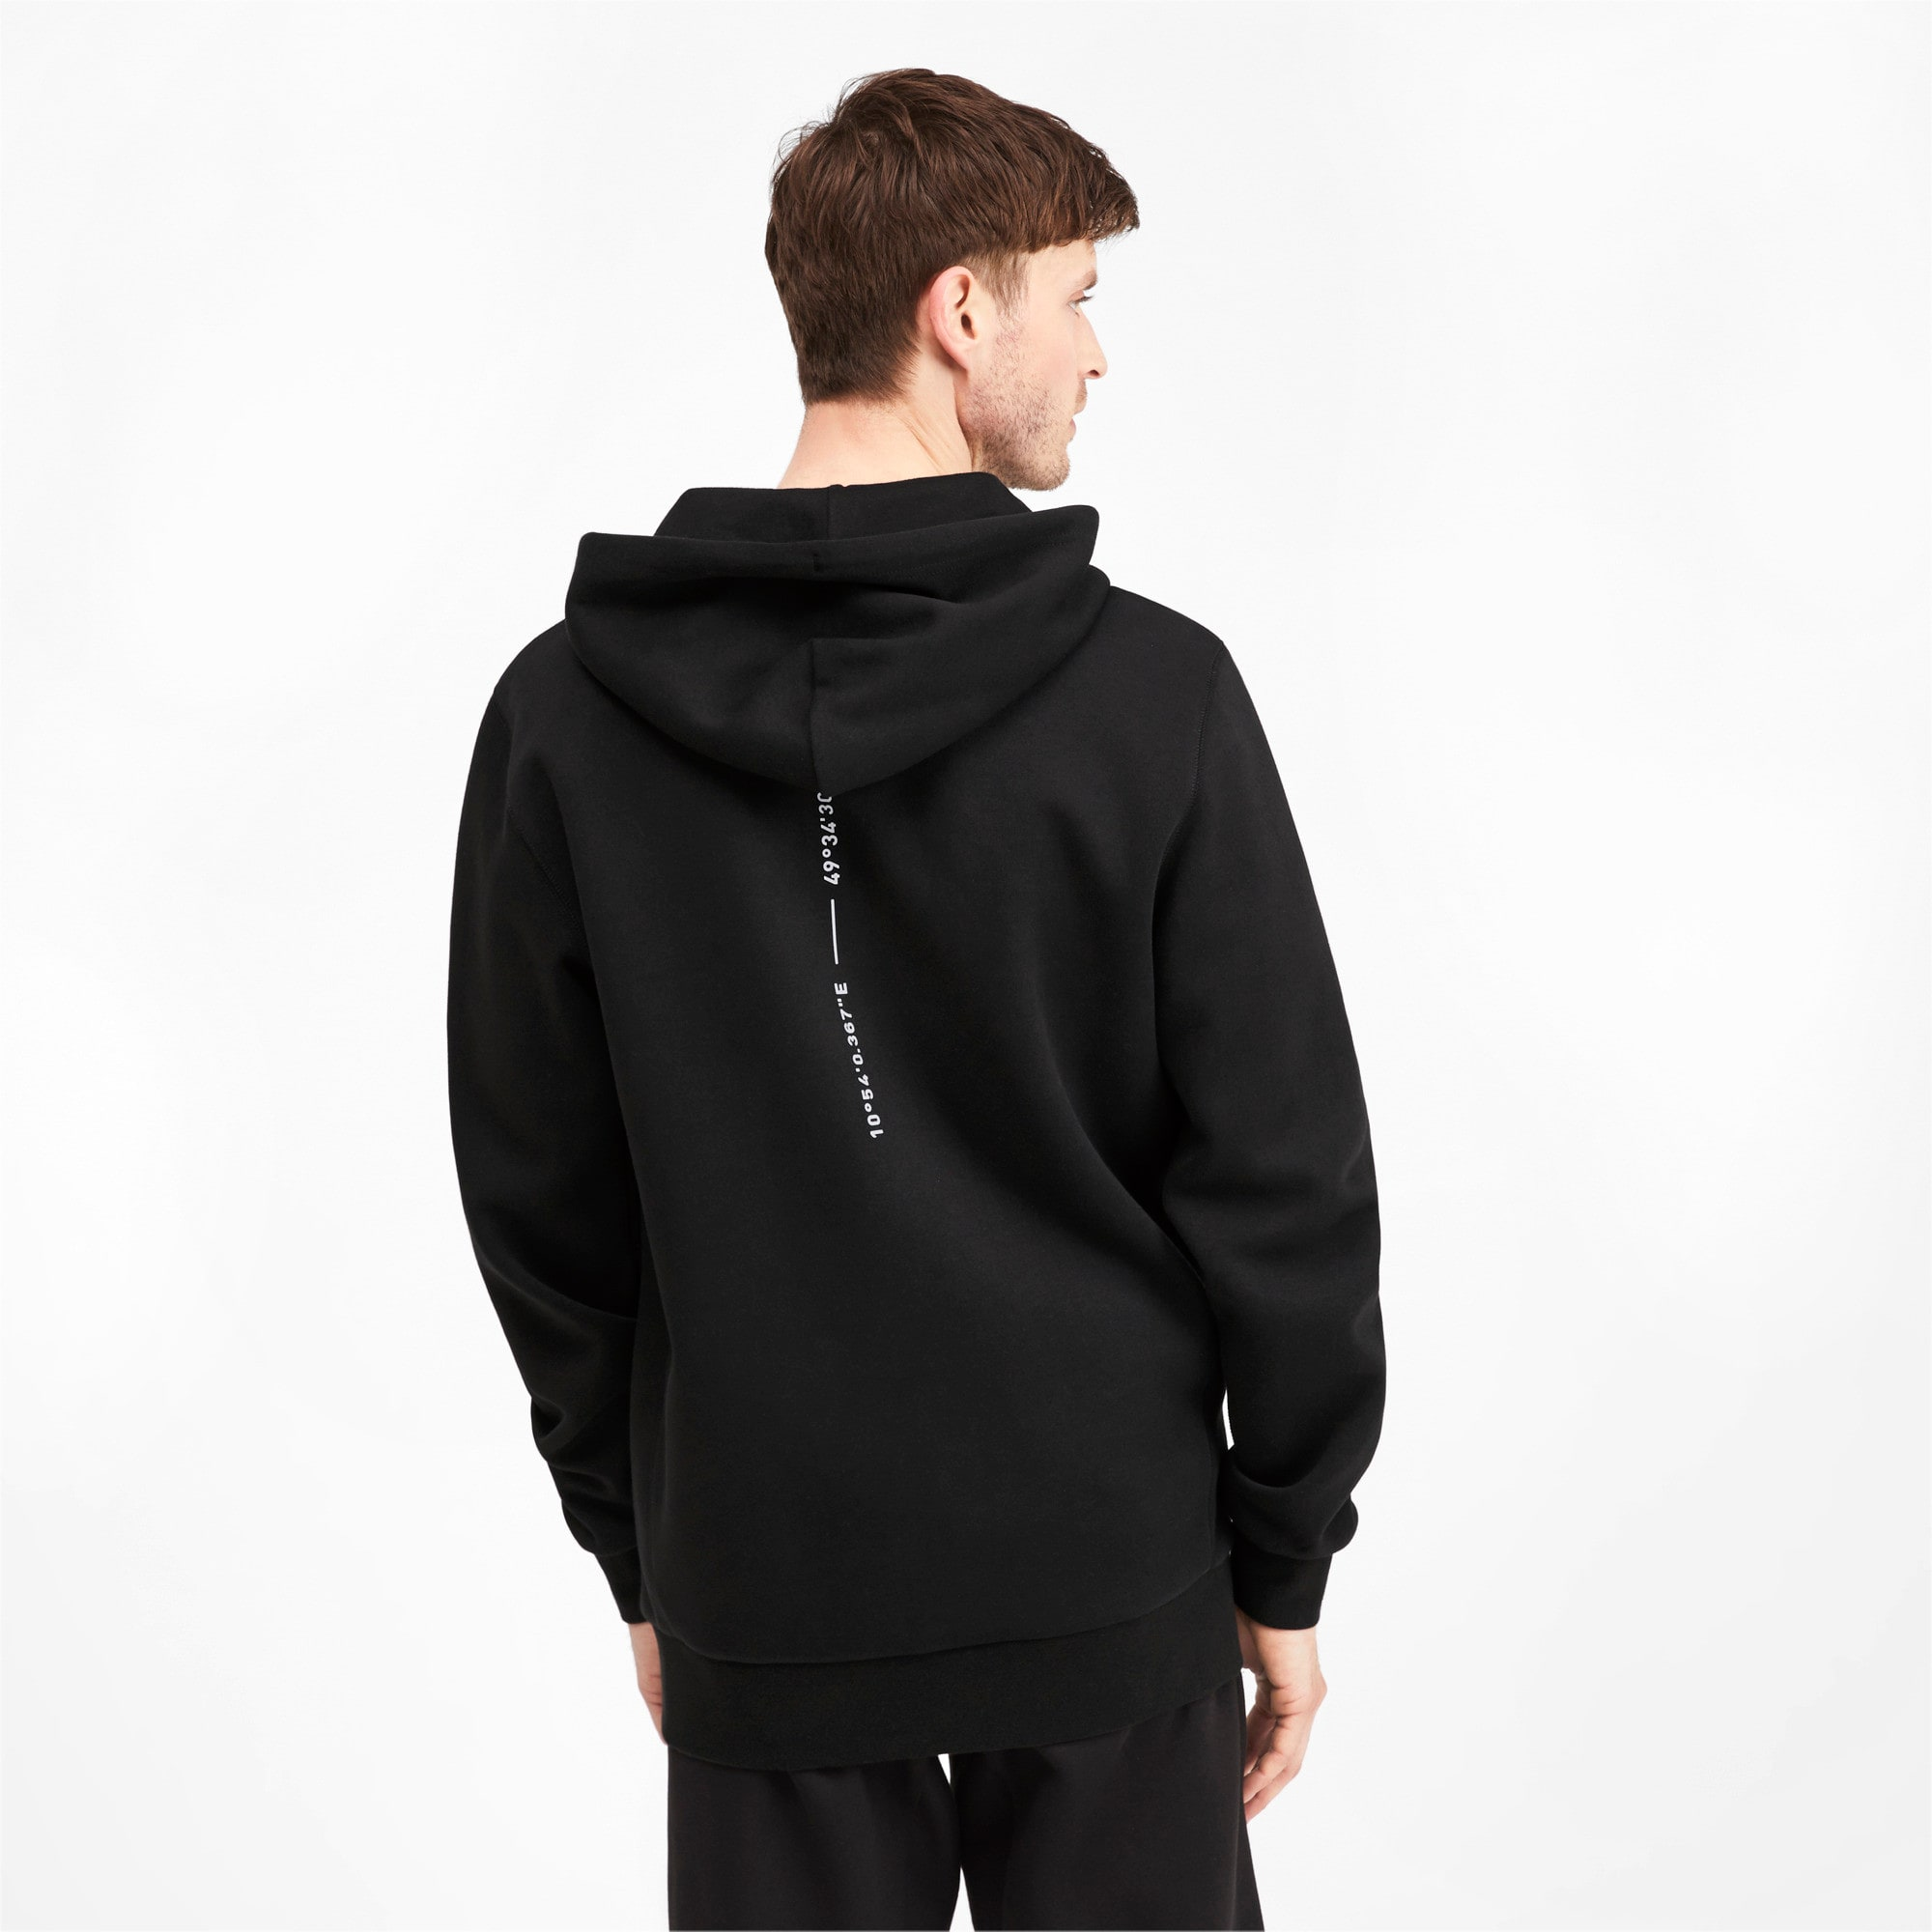 Thumbnail 3 of Epoch Long Sleeve Full Zip Men's Hoodie, Puma Black, medium